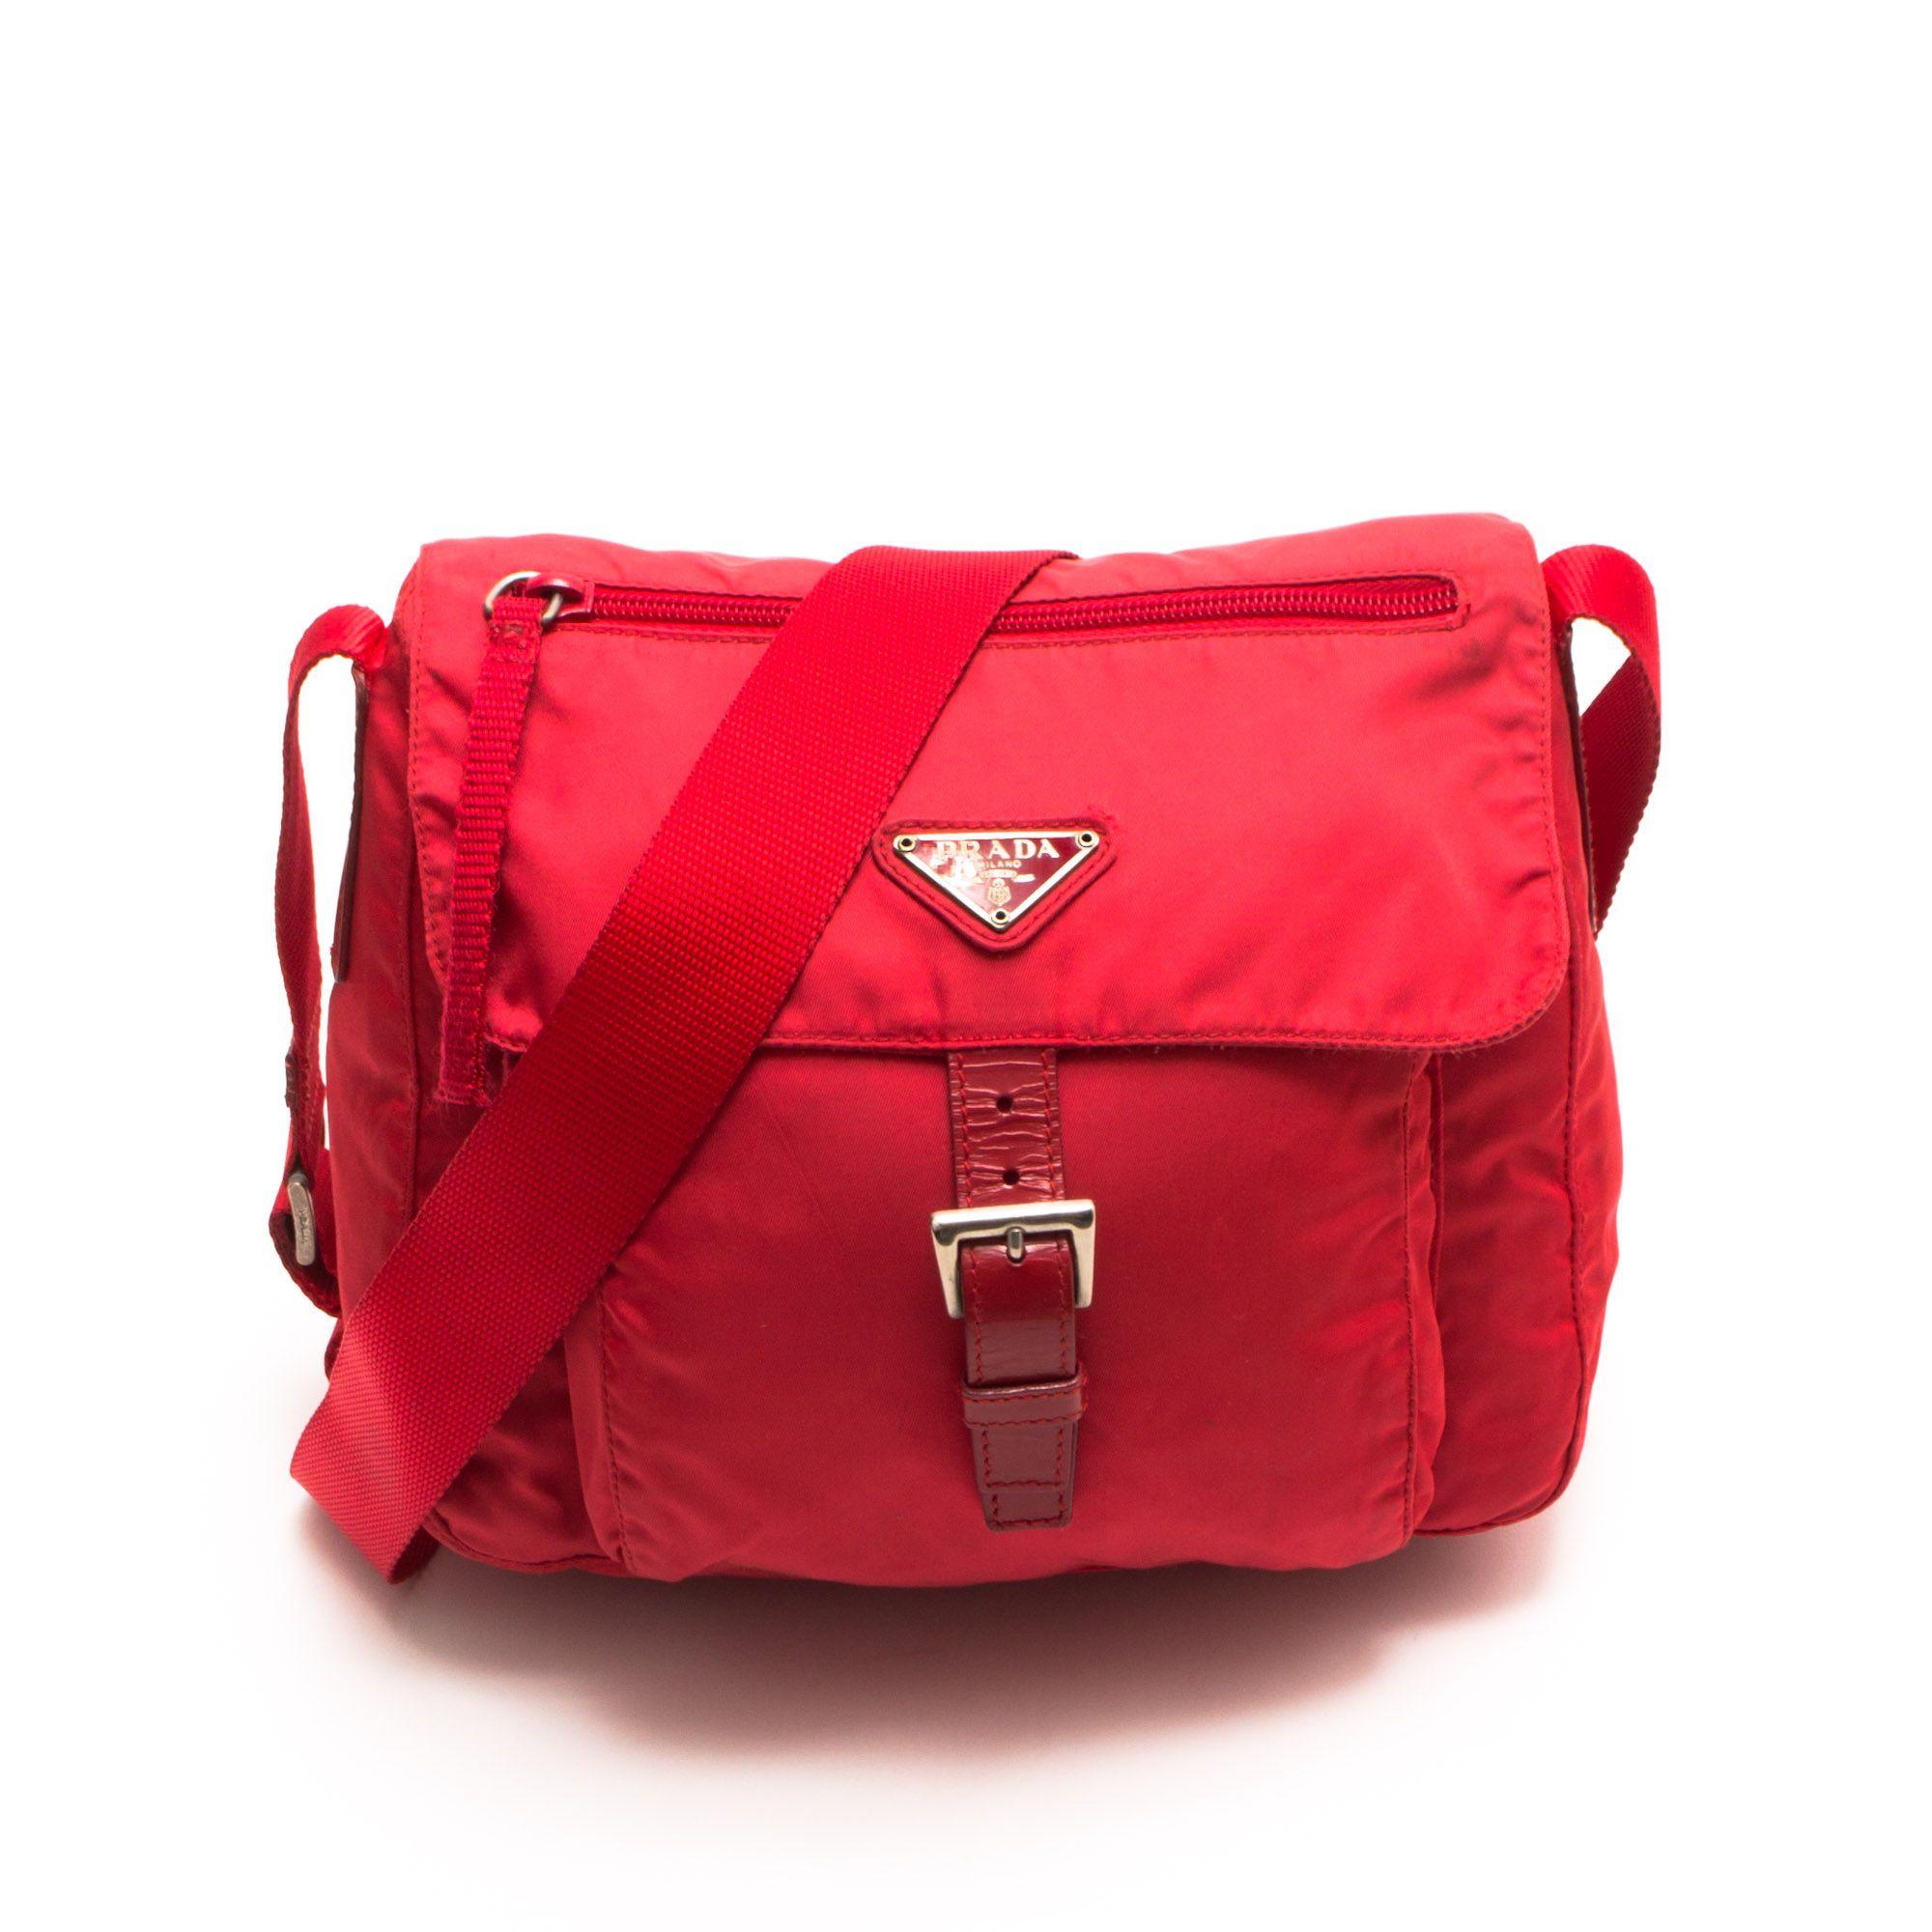 29a1771f562 Prada red Just Love, Messenger Bag, Branding Design, Prada, Corporate  Design,